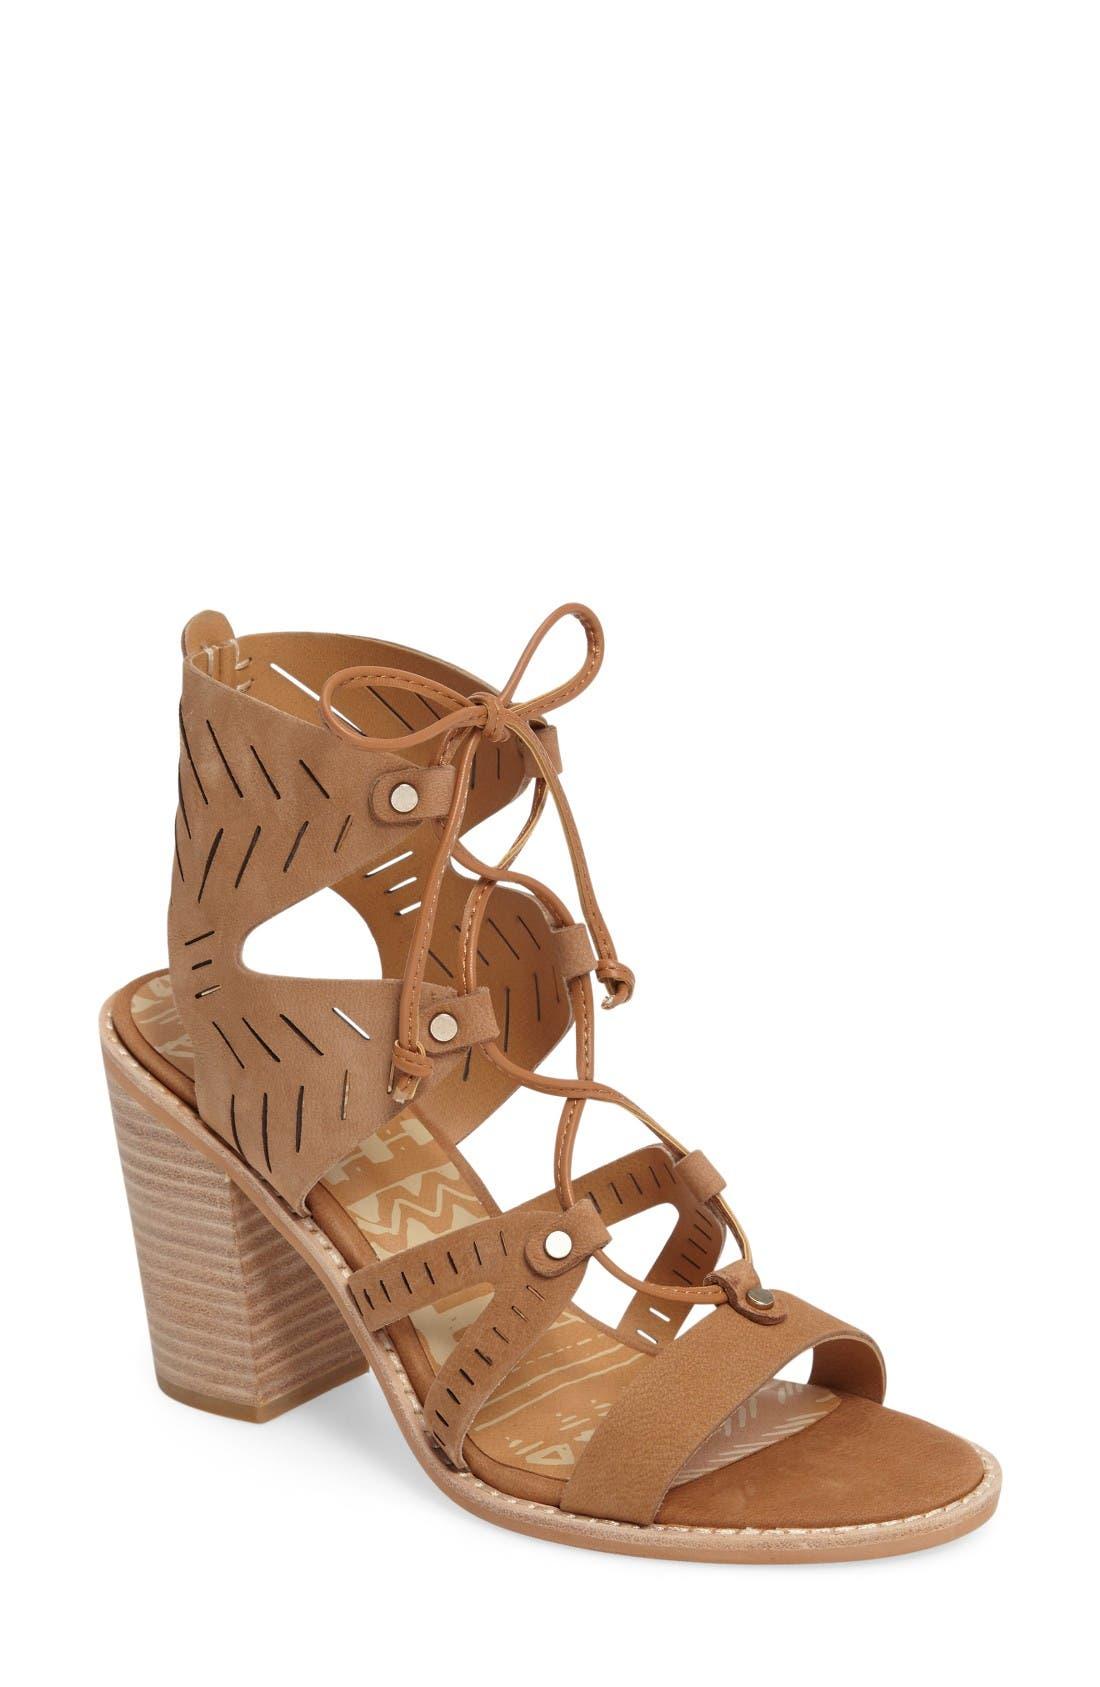 Luci Ghillie Lace Sandal,                         Main,                         color, Saddle Nubuck Leather